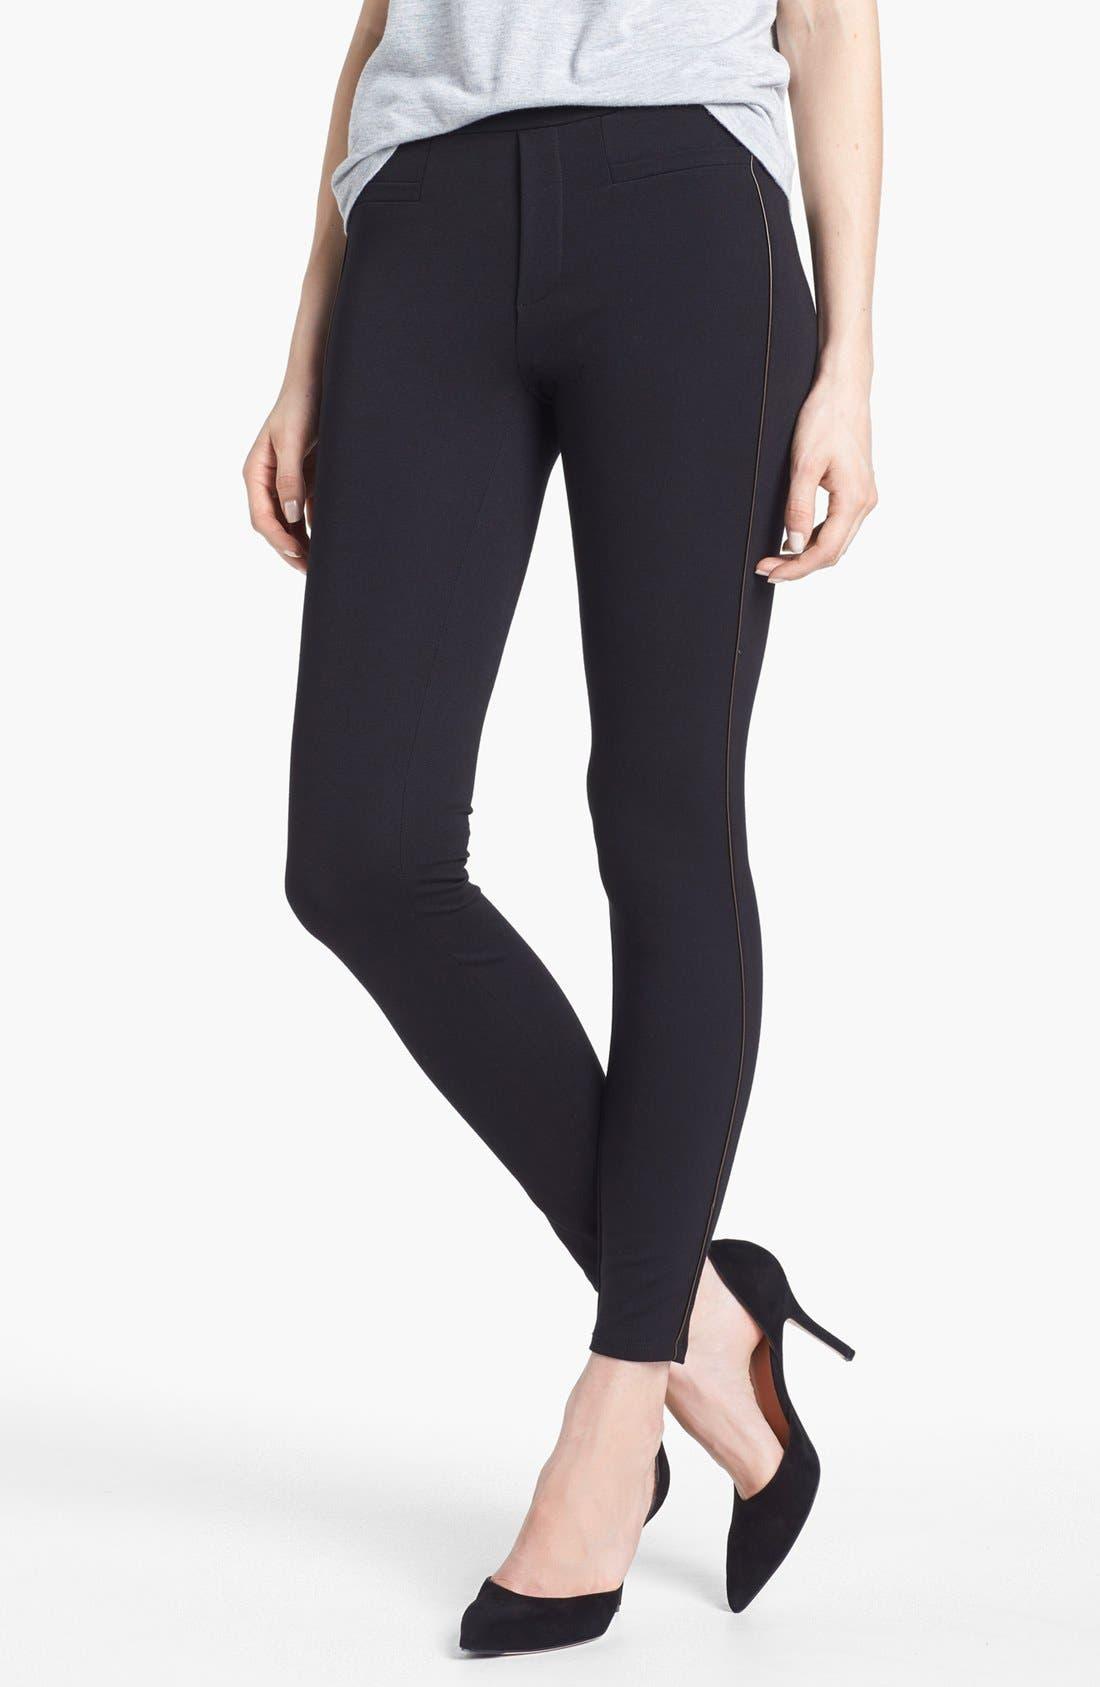 Alternate Image 1 Selected - Ella Moss 'Sandra' Faux Leather Trim Leggings